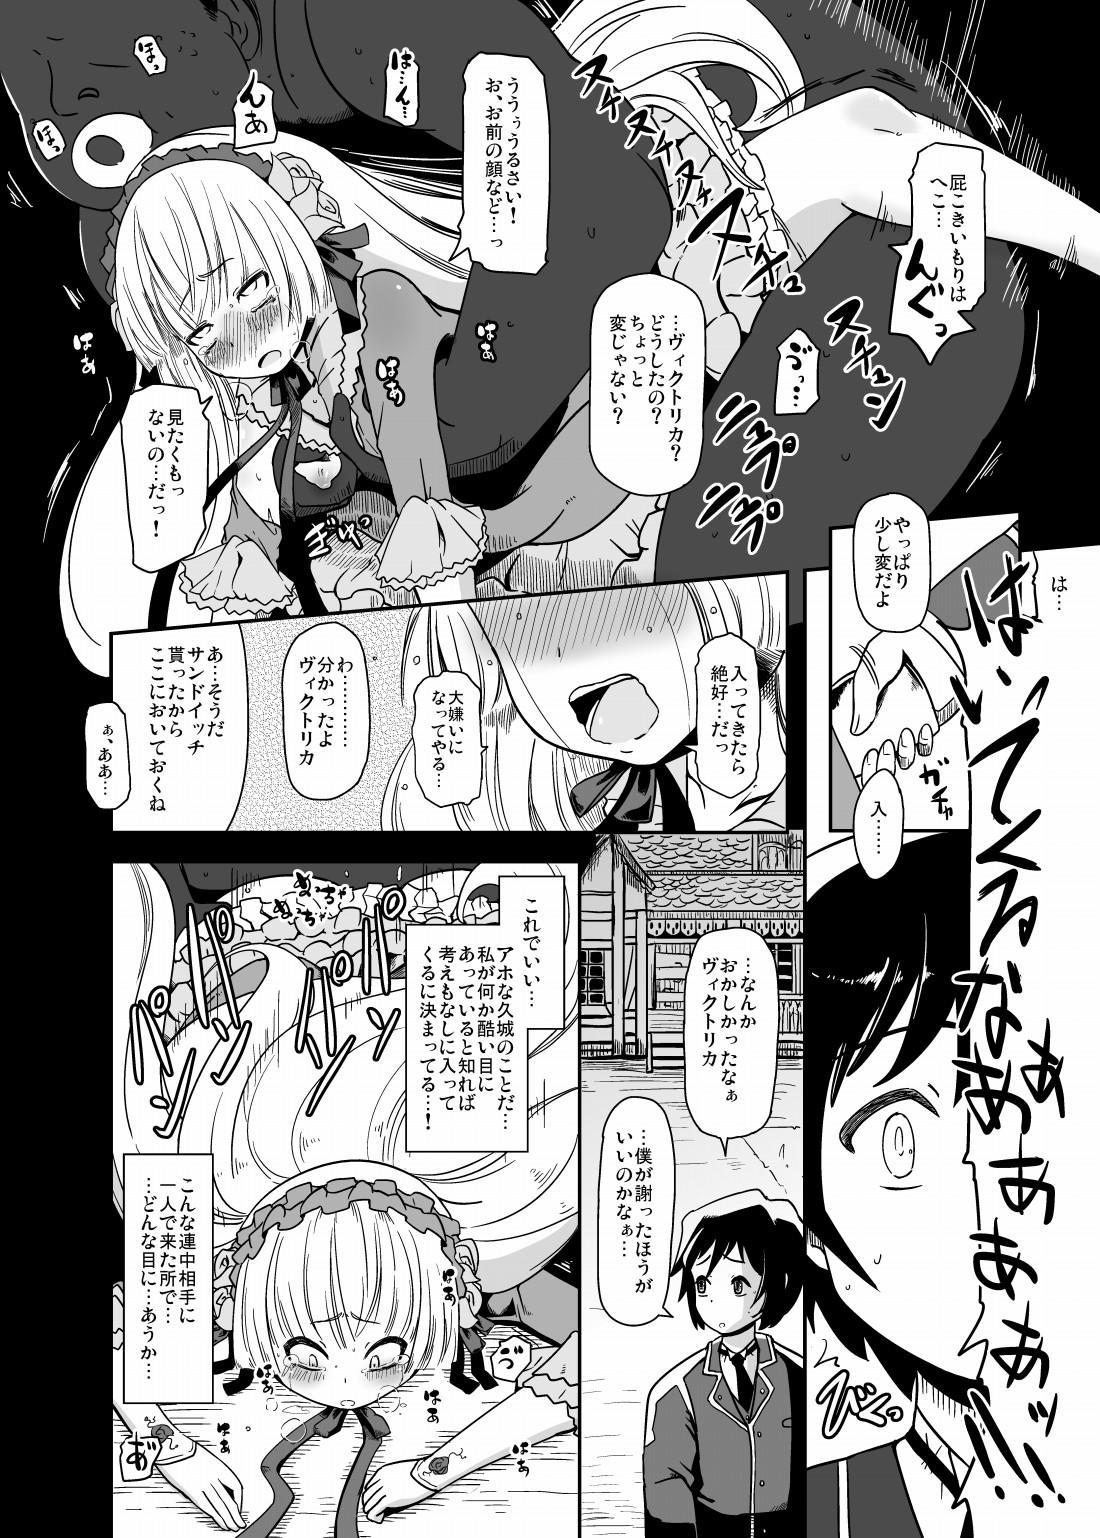 [HellDevice (nalvas)] Kuro Gosick-chan - Black Gosick Girl (GOSICK) [Digital] 12